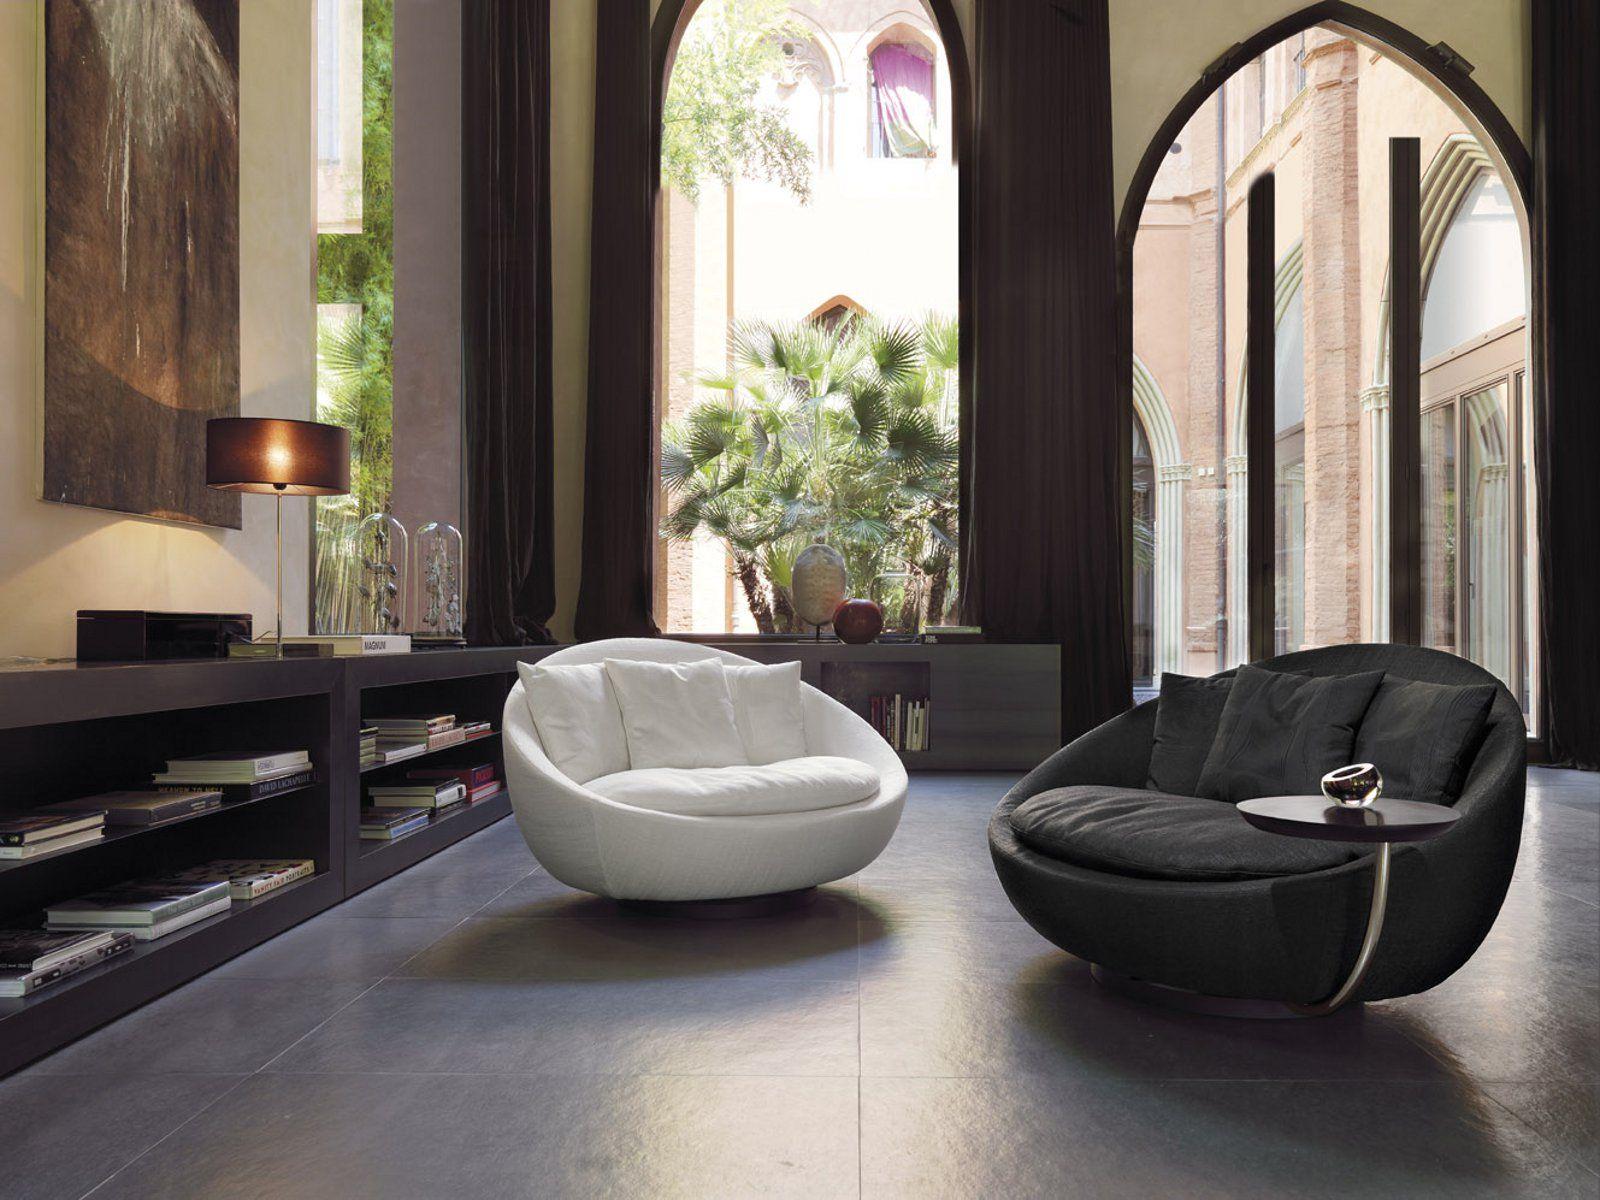 lacoon armchair by d sir e design jai jalan. Black Bedroom Furniture Sets. Home Design Ideas